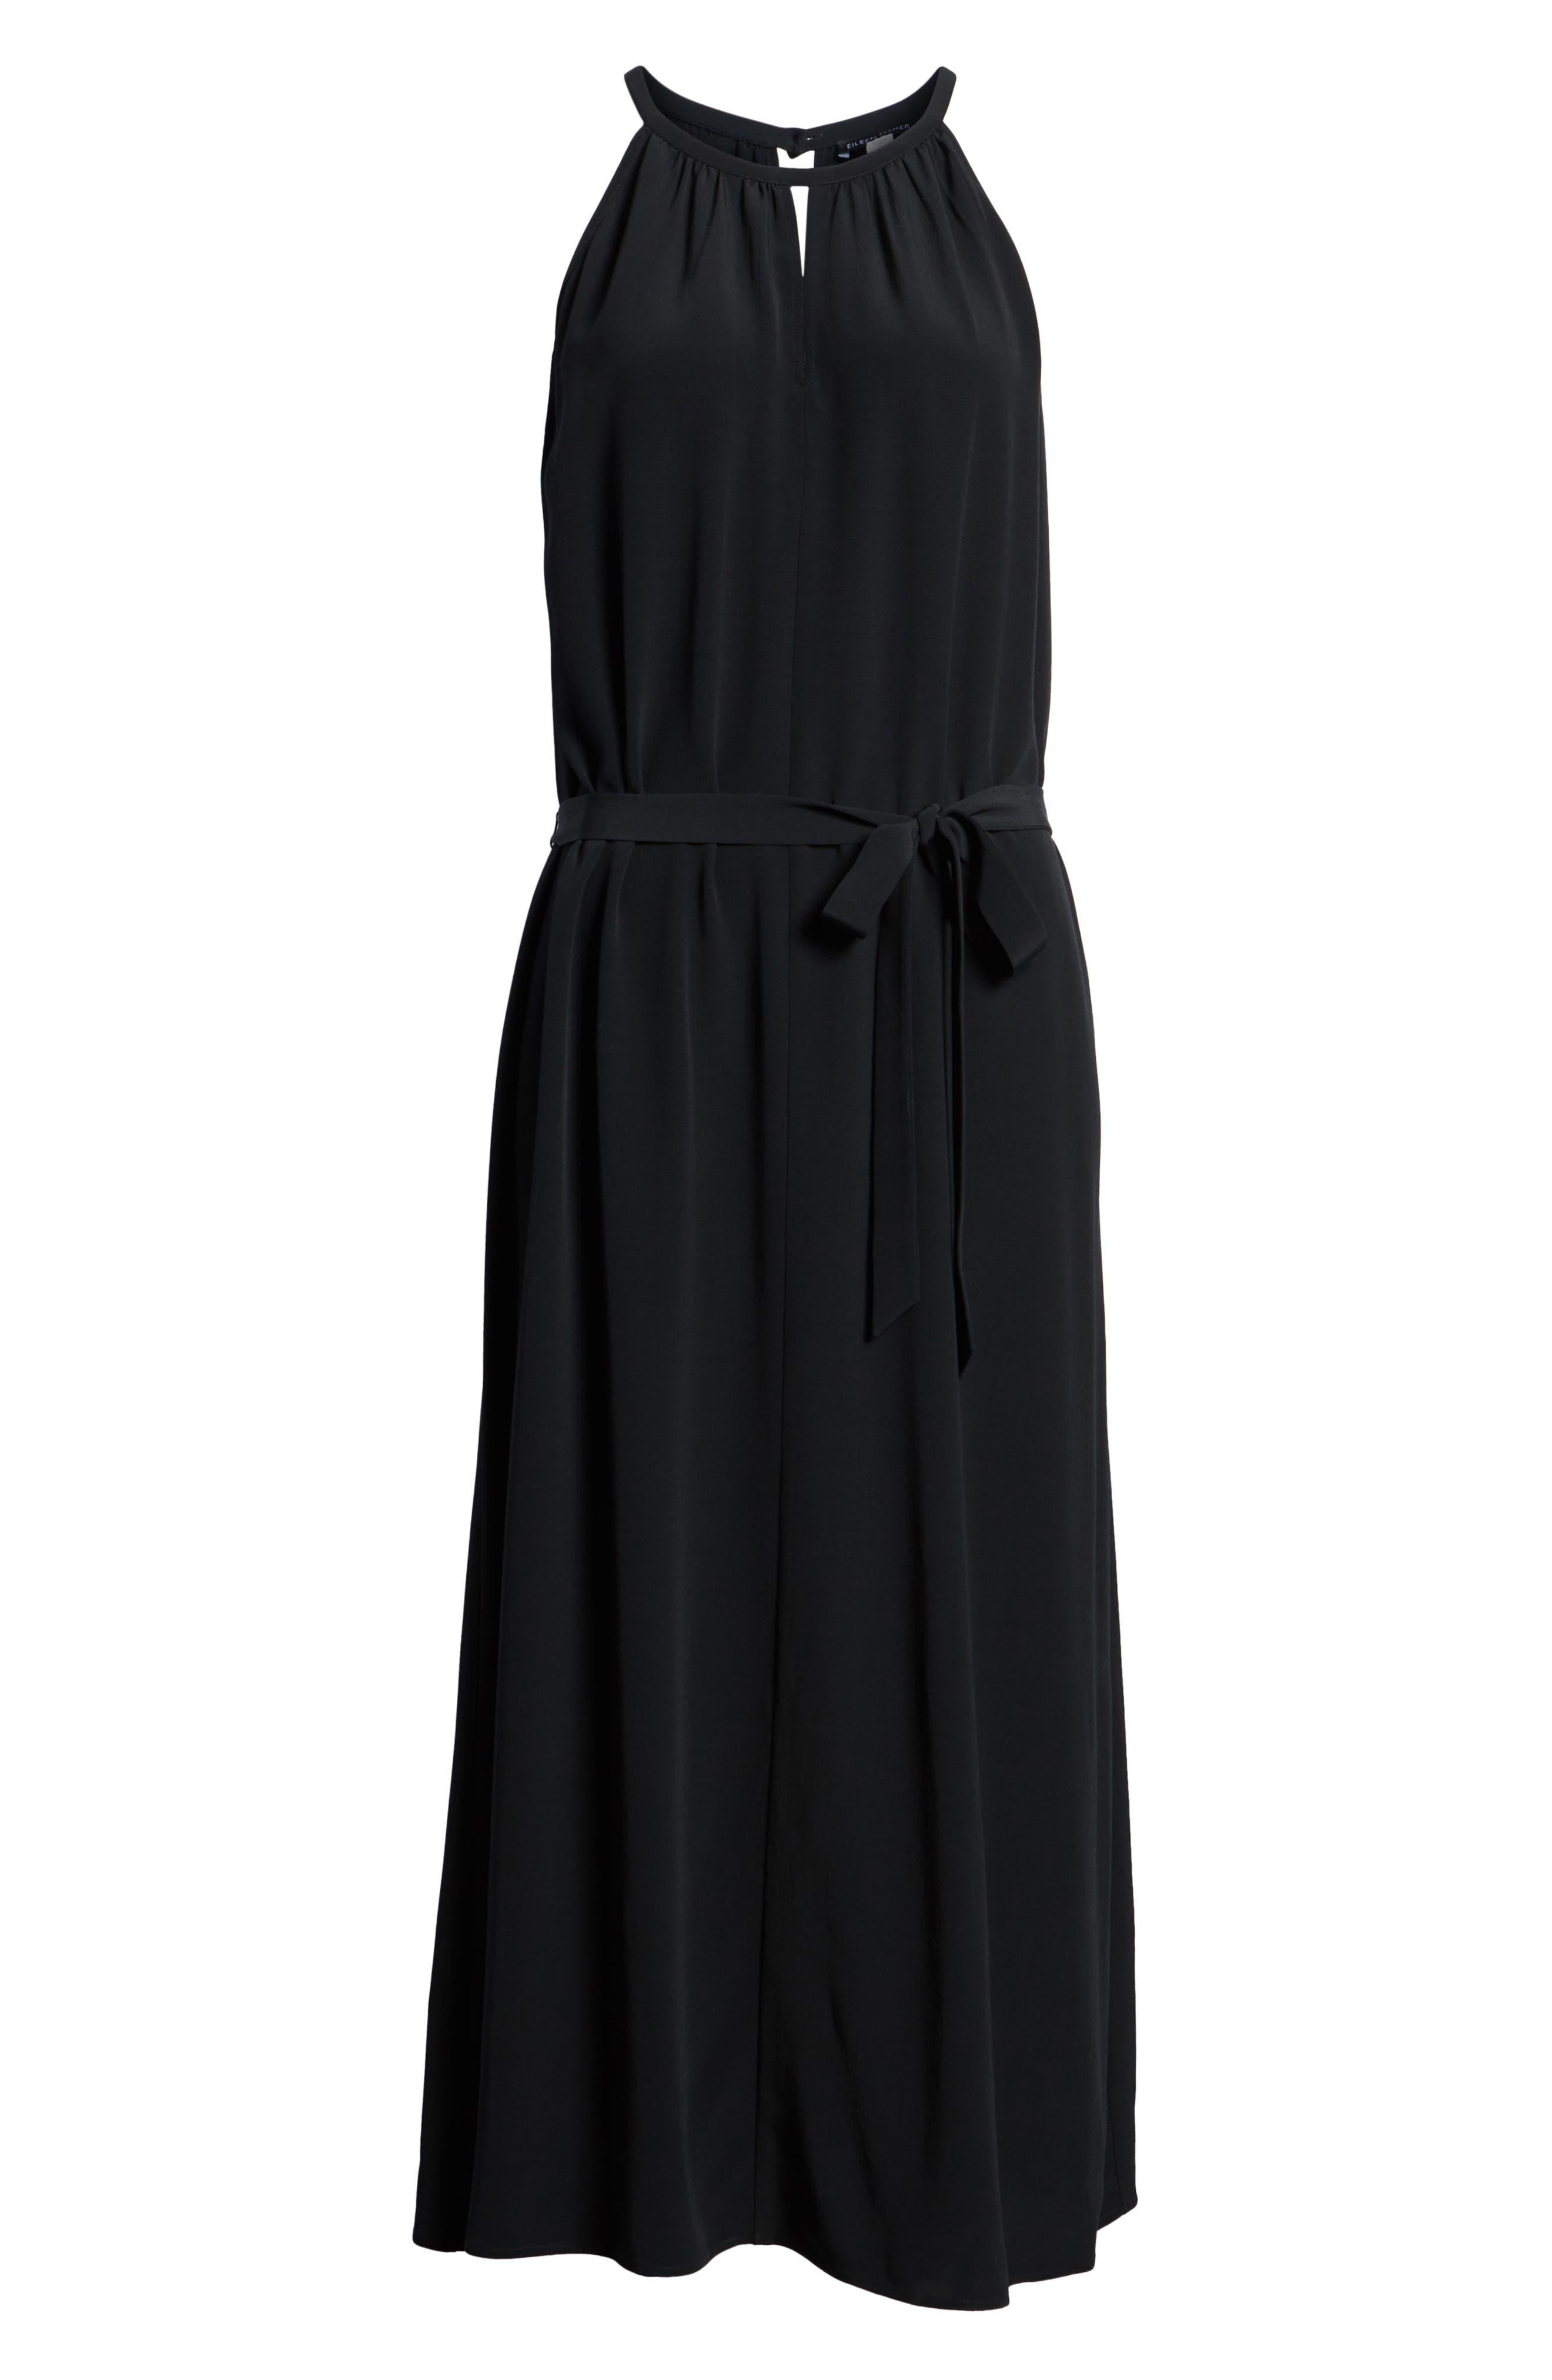 Tencel<sup>®</sup> Lyocell Blend Midi Dress,                             Alternate thumbnail 7, color,                             001